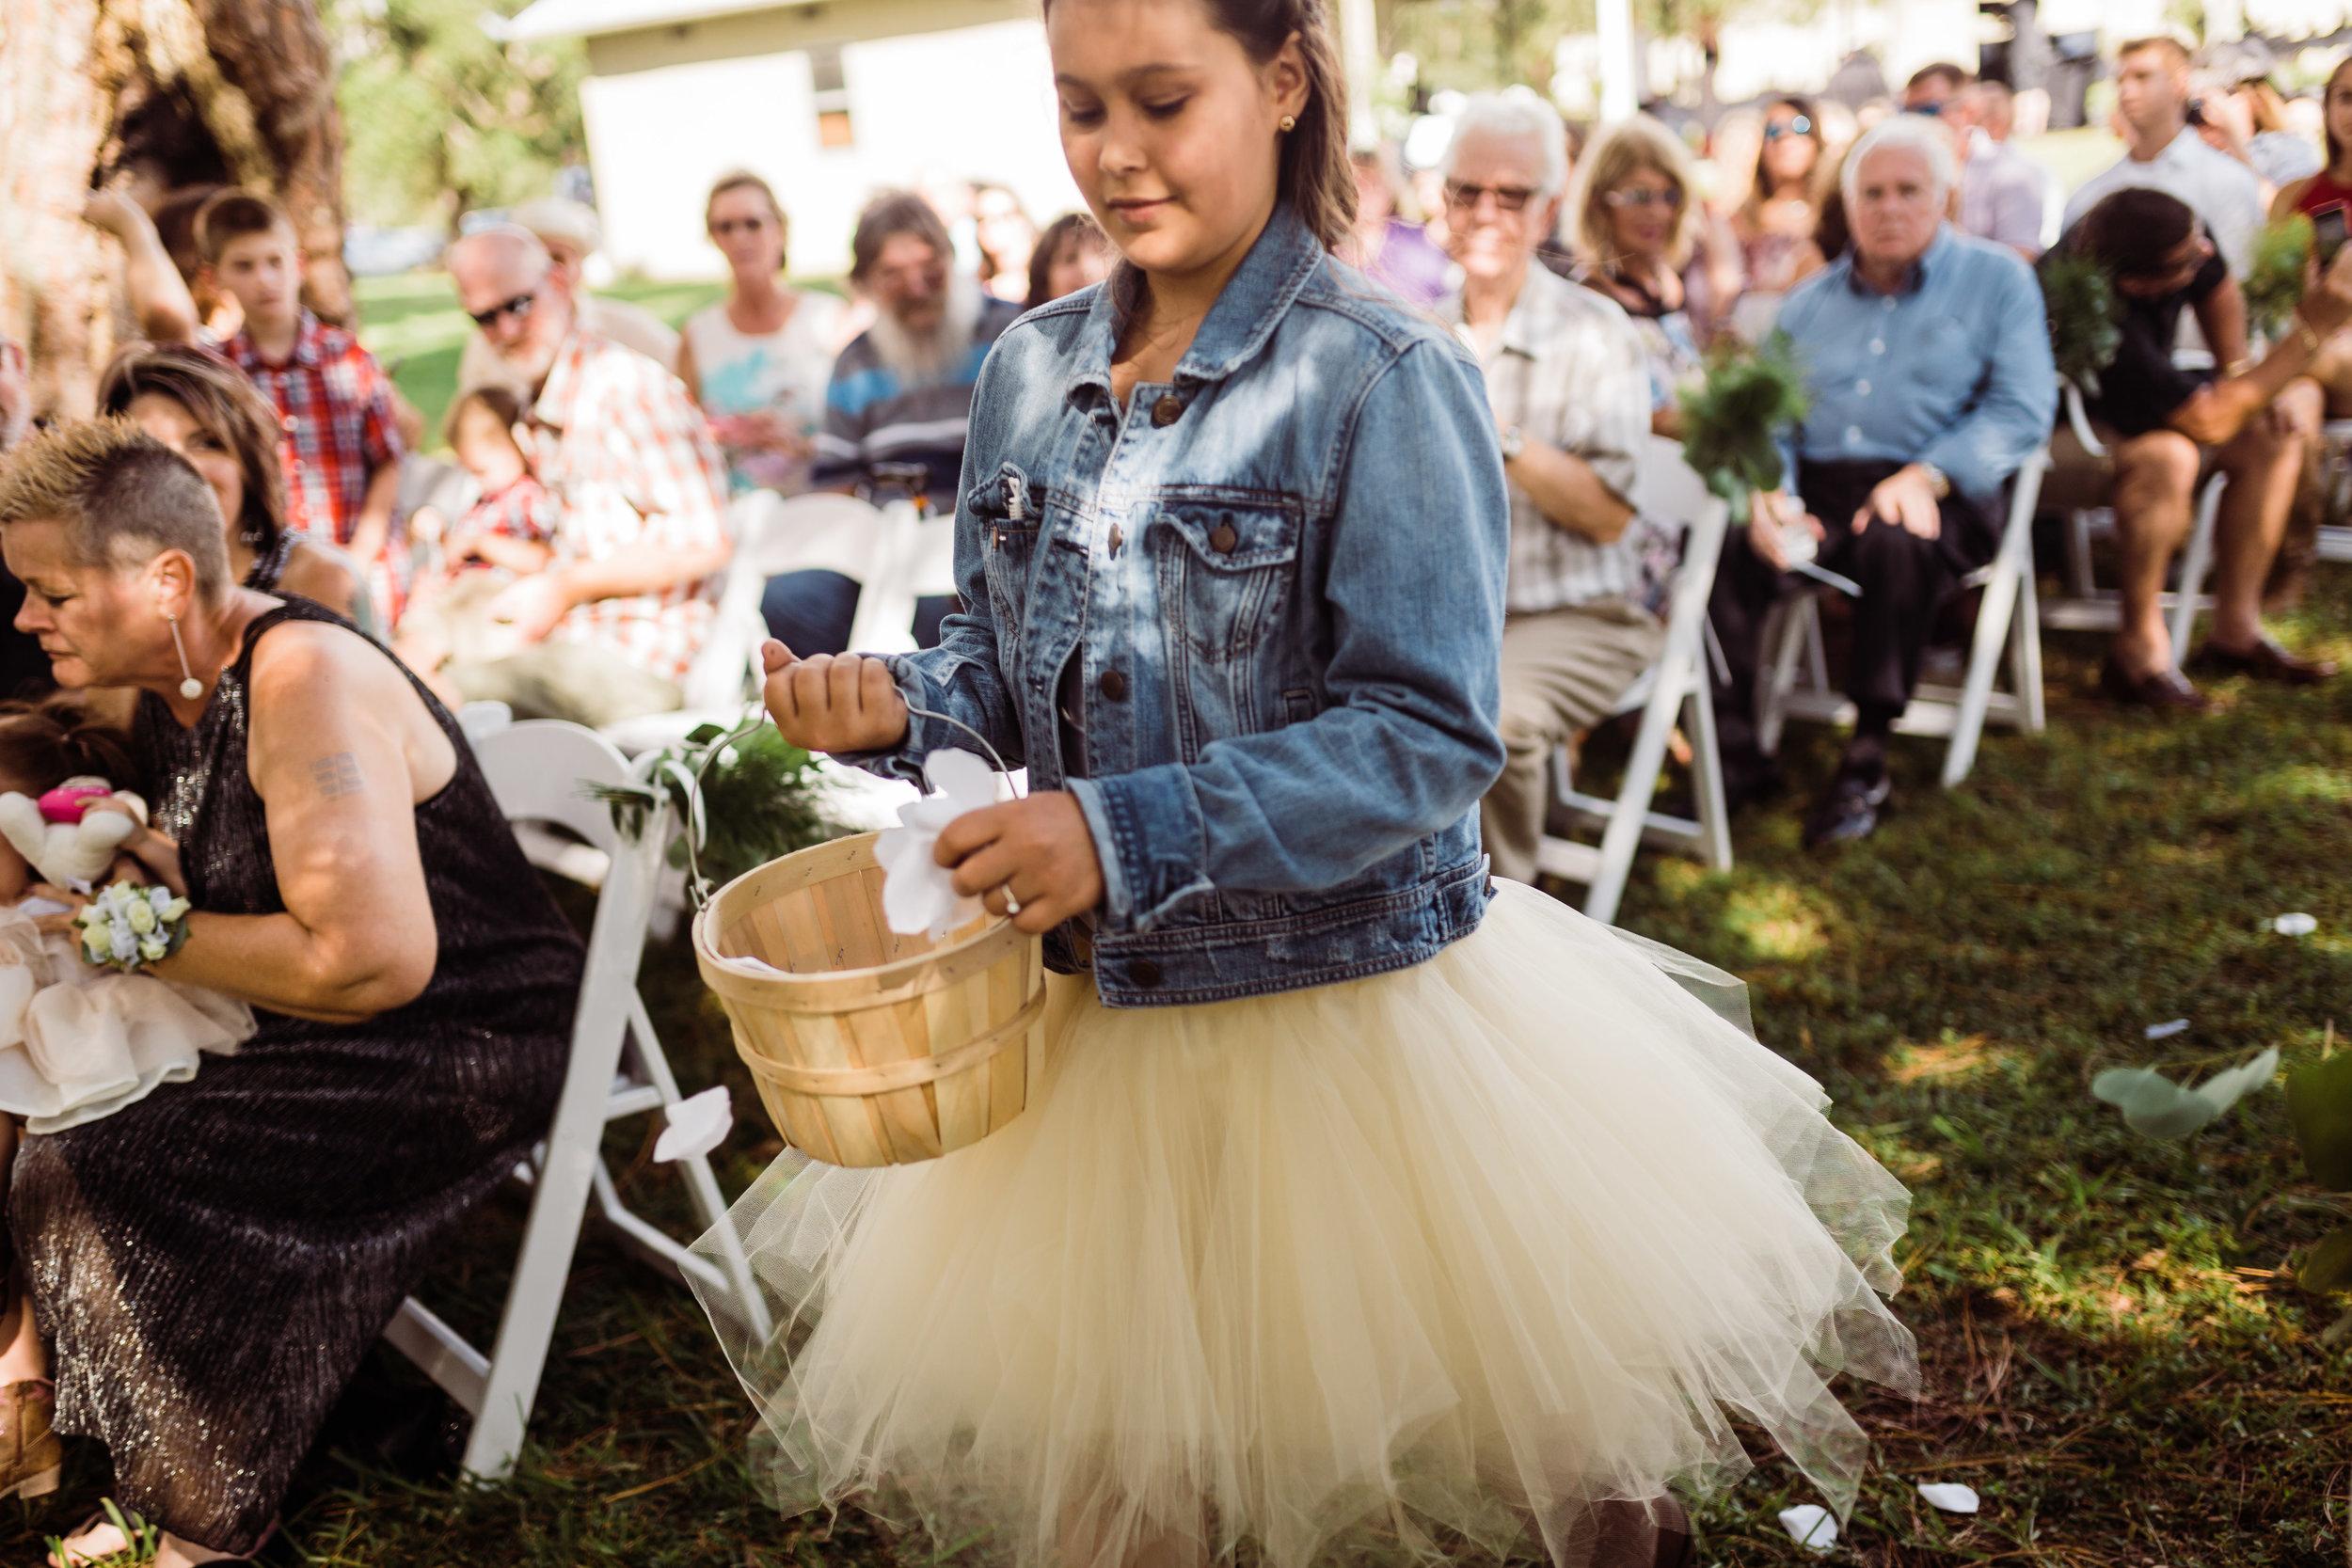 2017.10.14 Samantha and Matthew Crabtree Sarasota Wedding (124 of 708).jpg